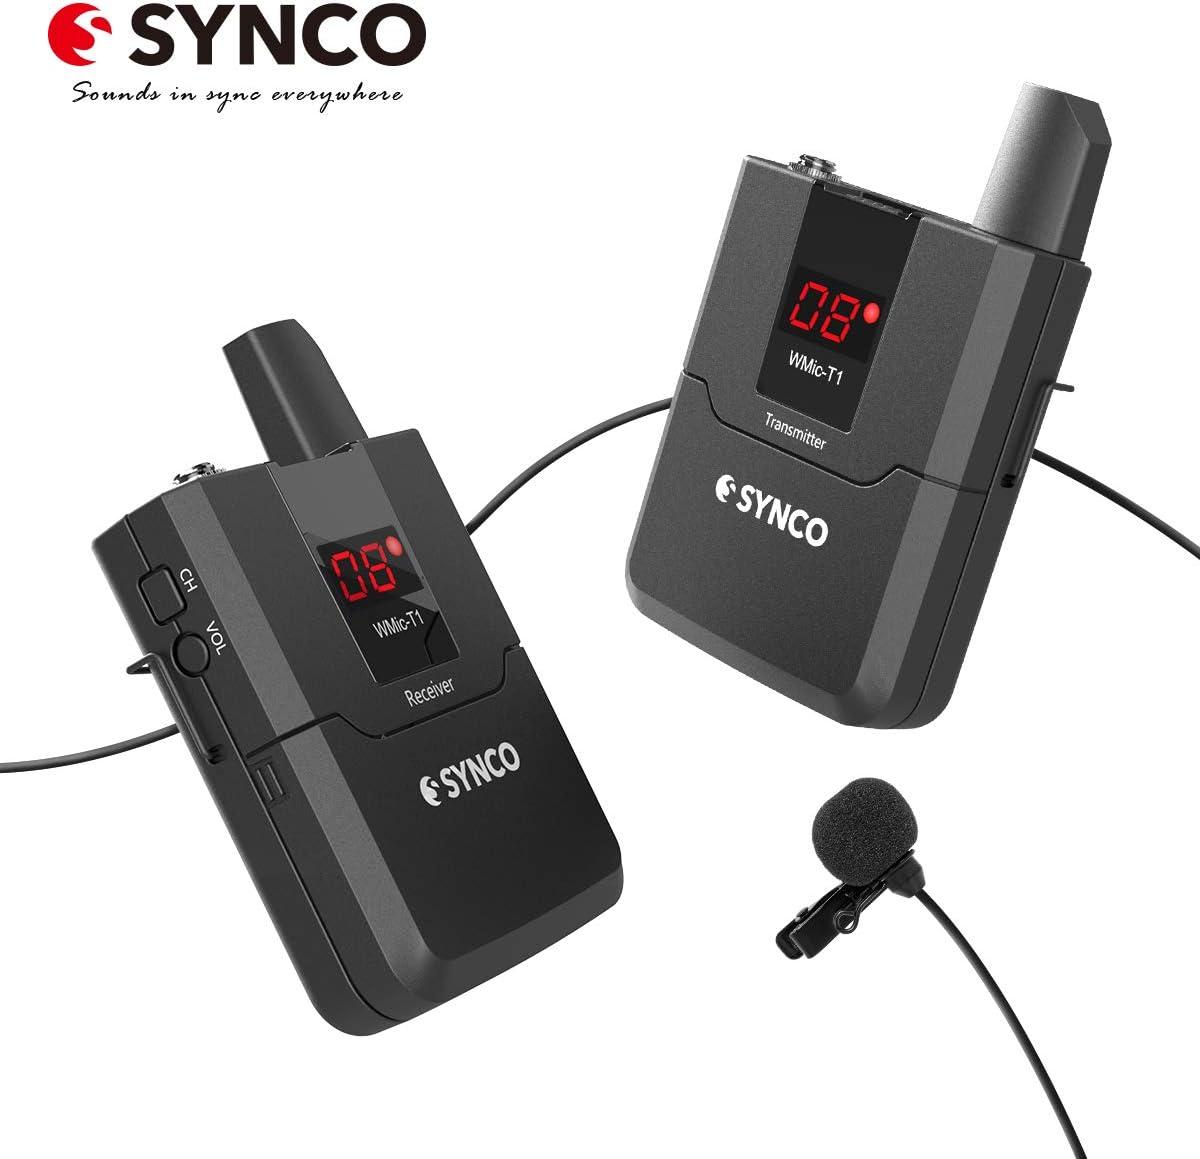 SYNCO WMic T1 UHF-Micrófono-Solapa-Inalámbrico-Sistema 16 Canales para DSLR Cámara, Videocámara y Smartphone, 50m Rango de Transmisión, Adecuado para Entrevista, Enseñanza, Presentación etc